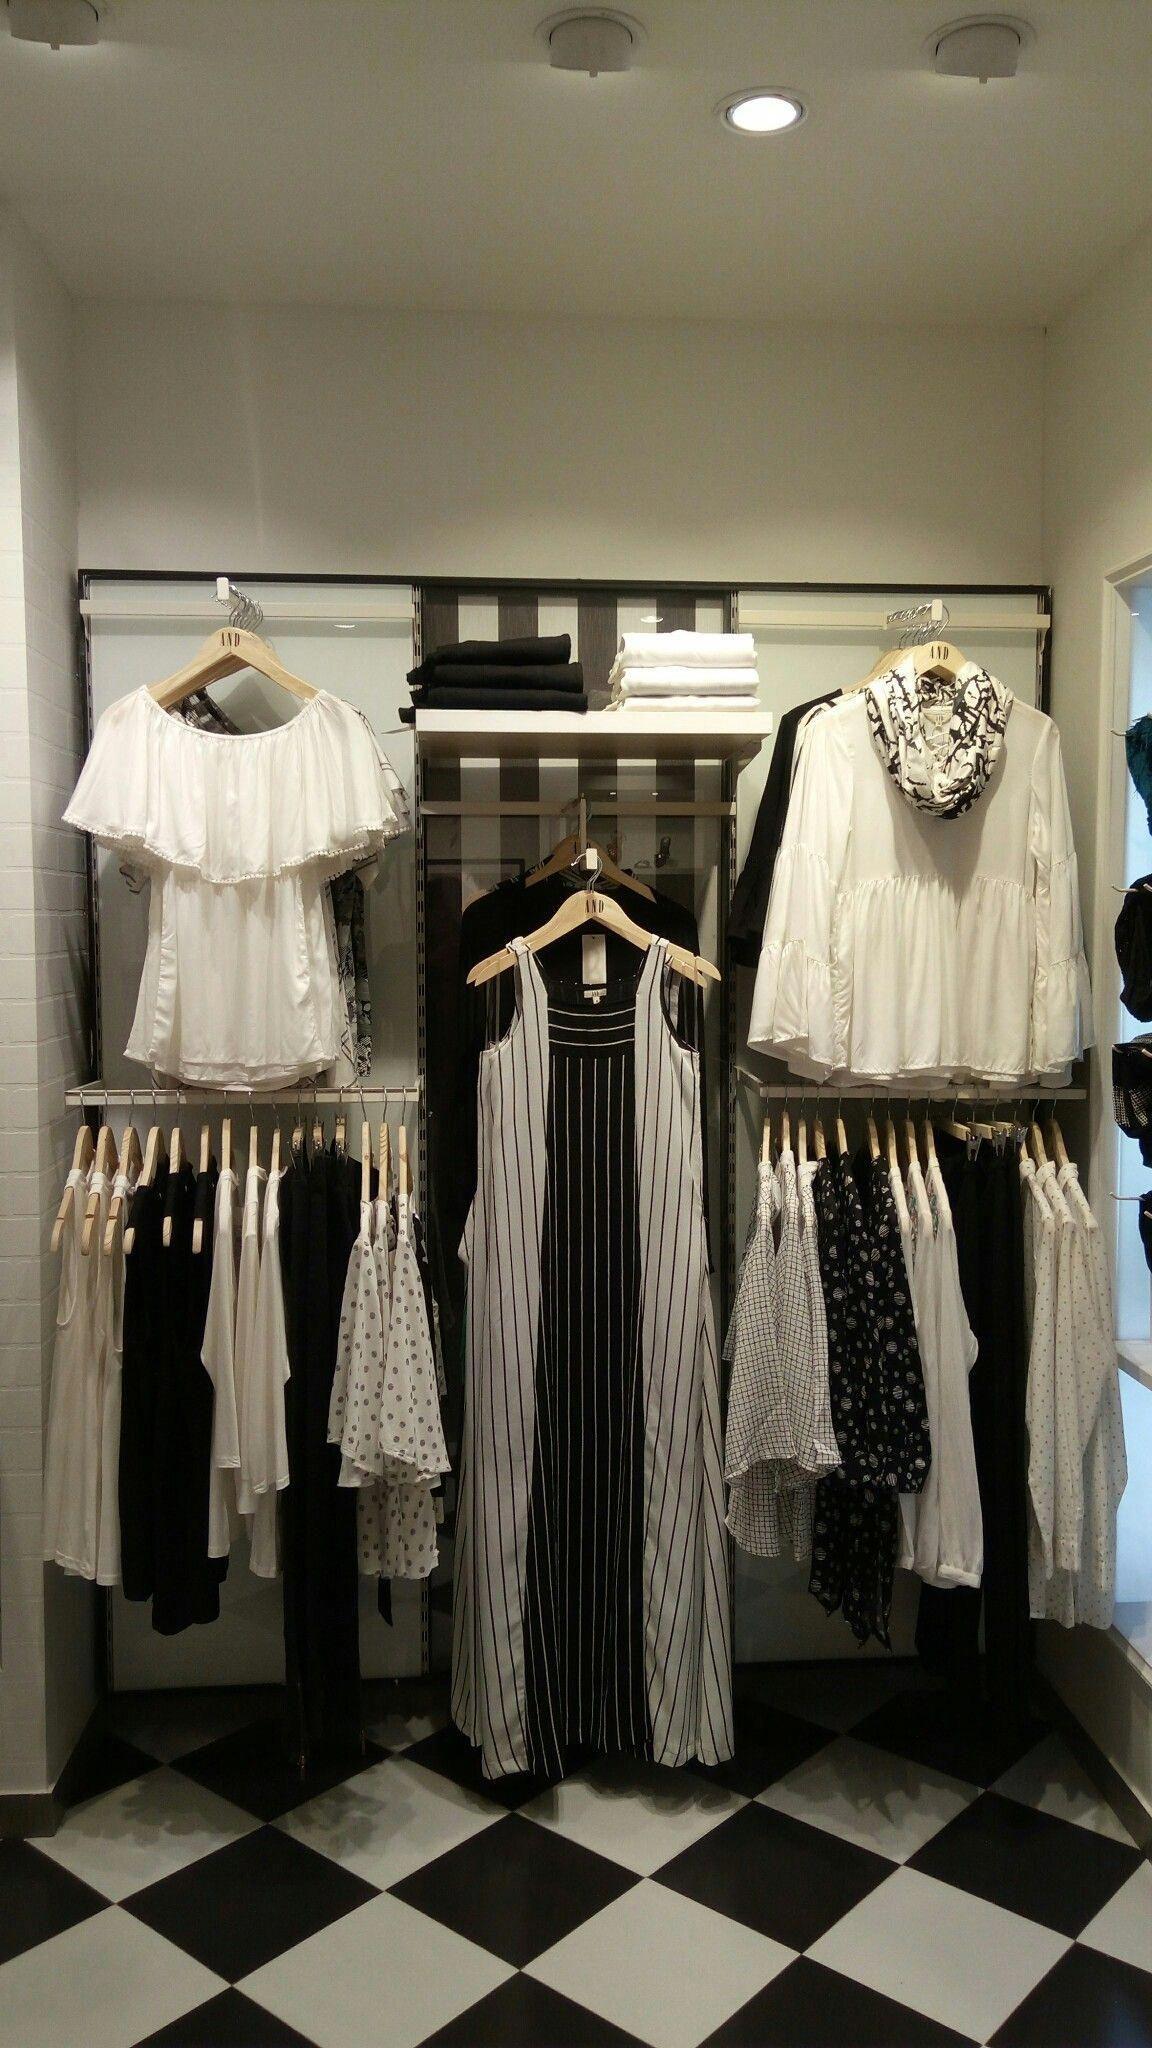 Fashion Designer Visual Merchandising Merchandising Retail Merchandising Fashion Merchan Clothing Store Design Clothing Displays Clothing Boutique Interior